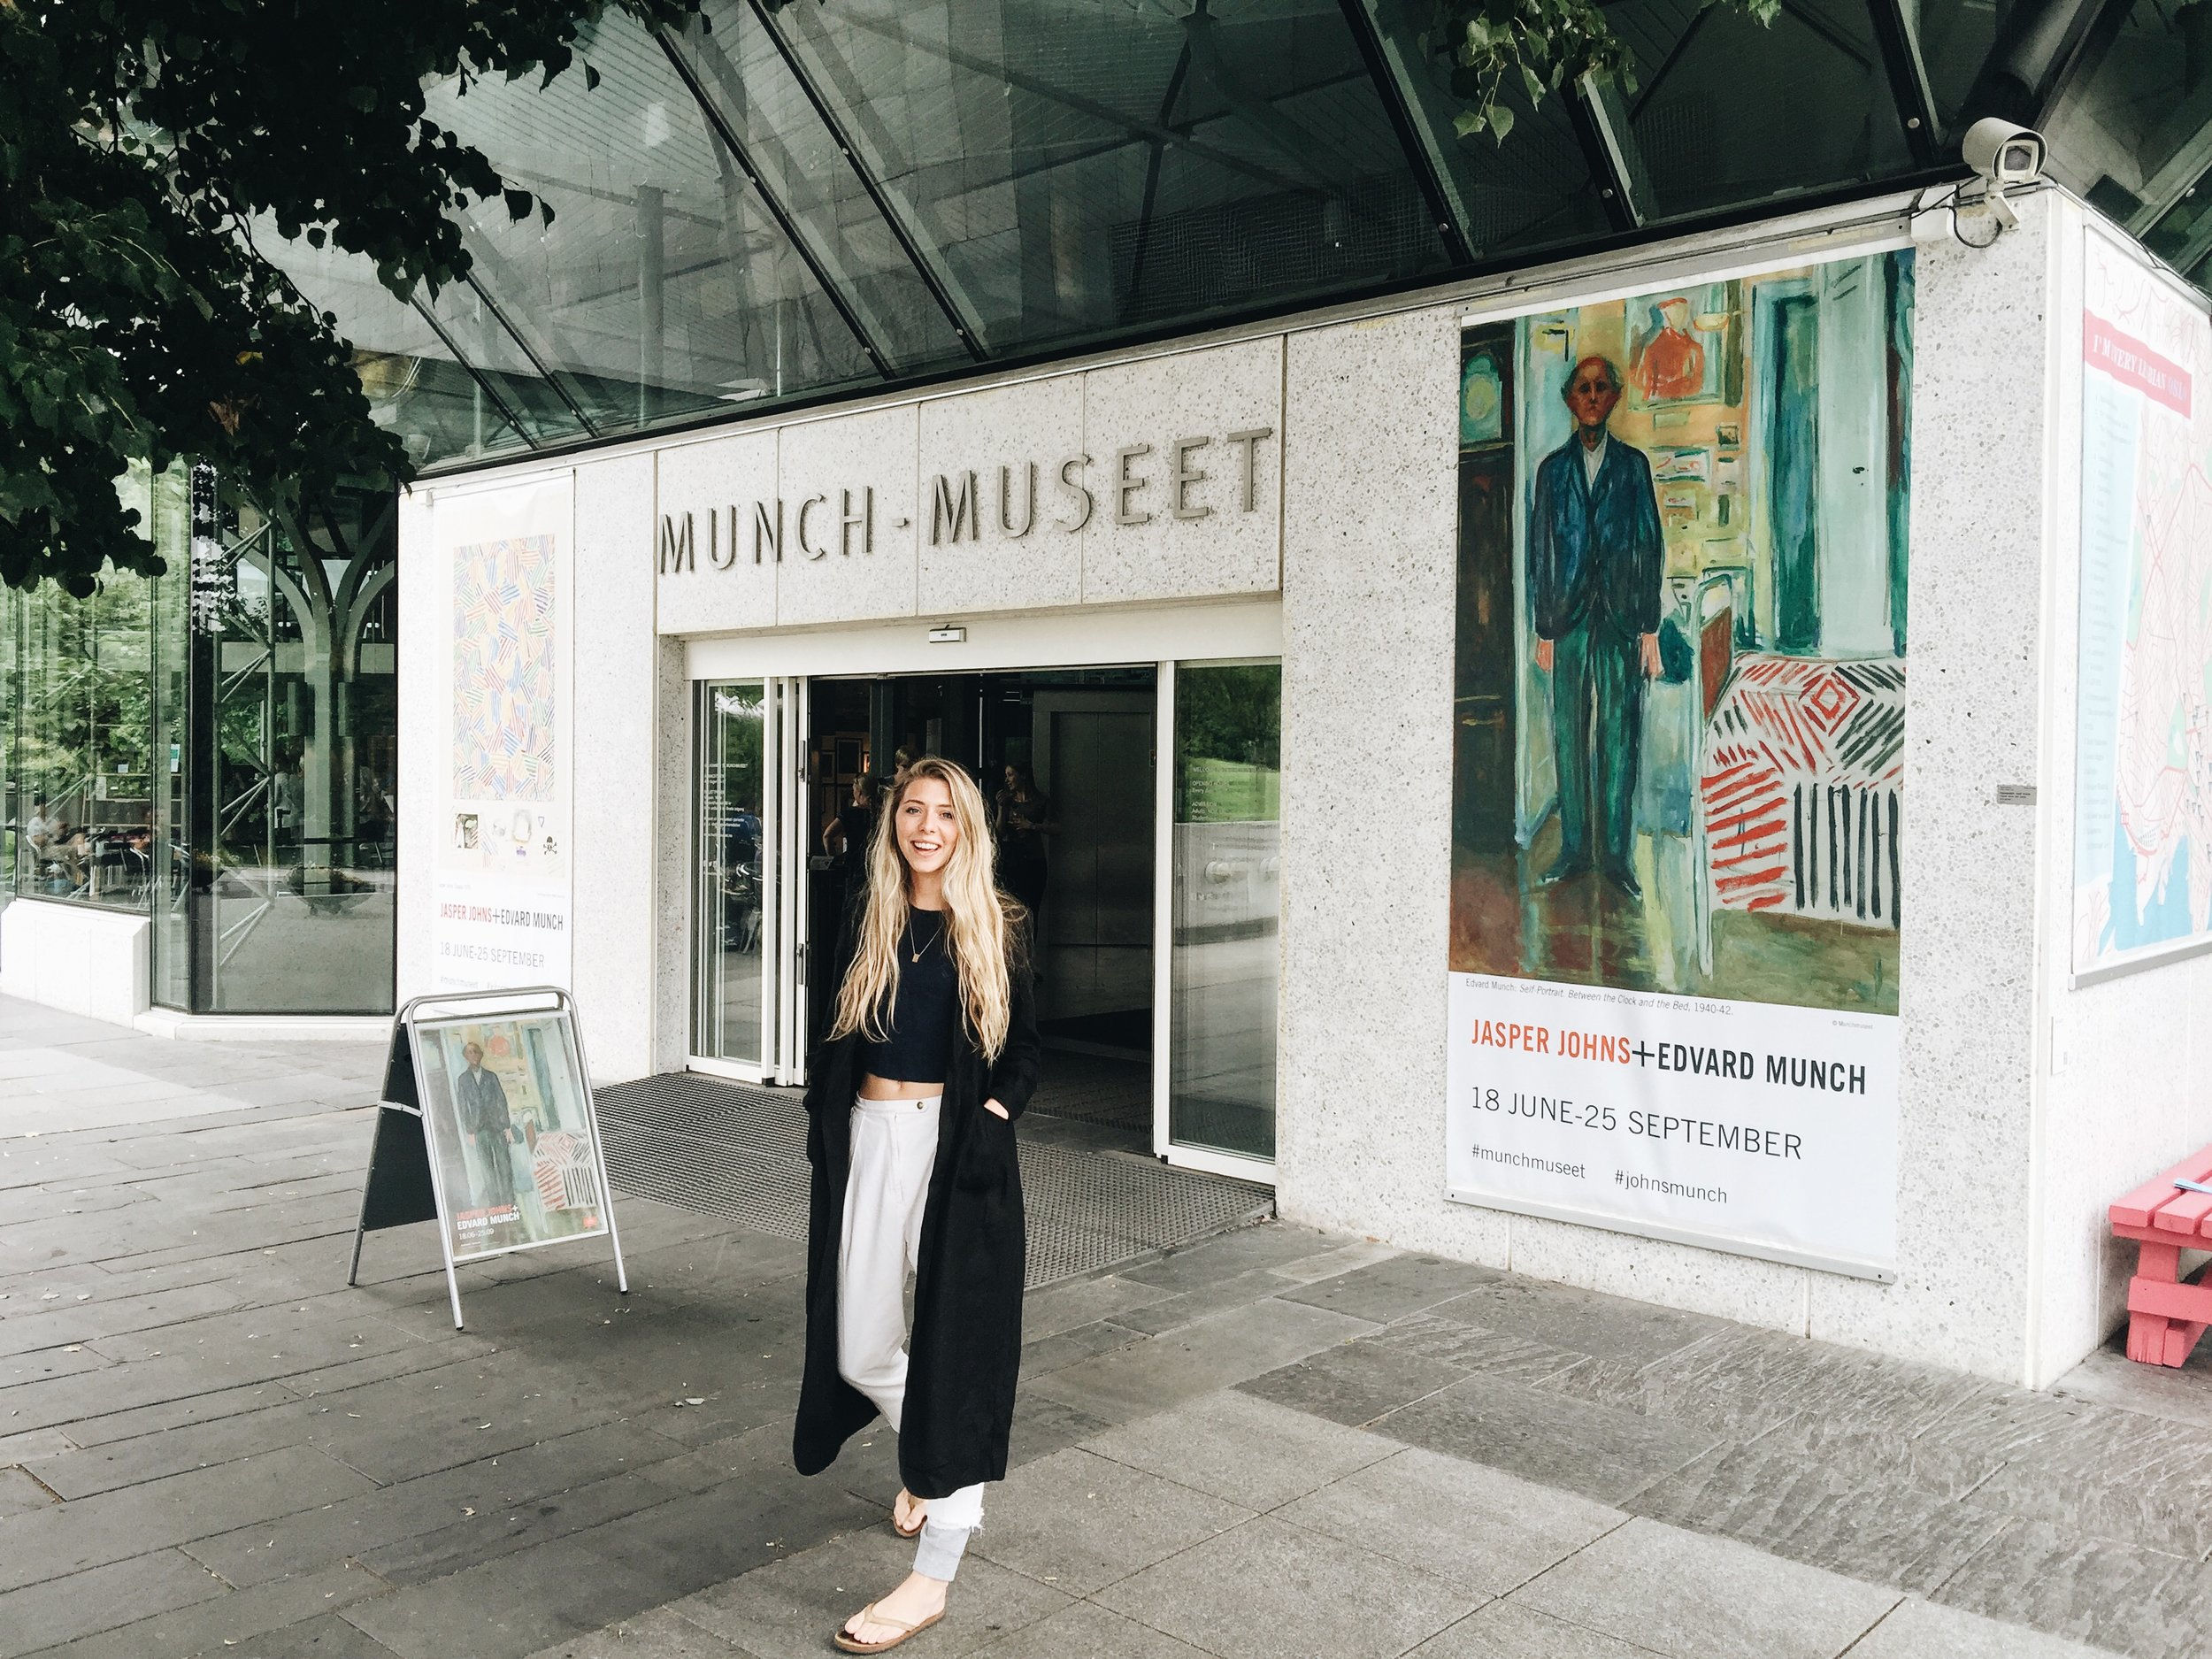 Edvard Munch Museum